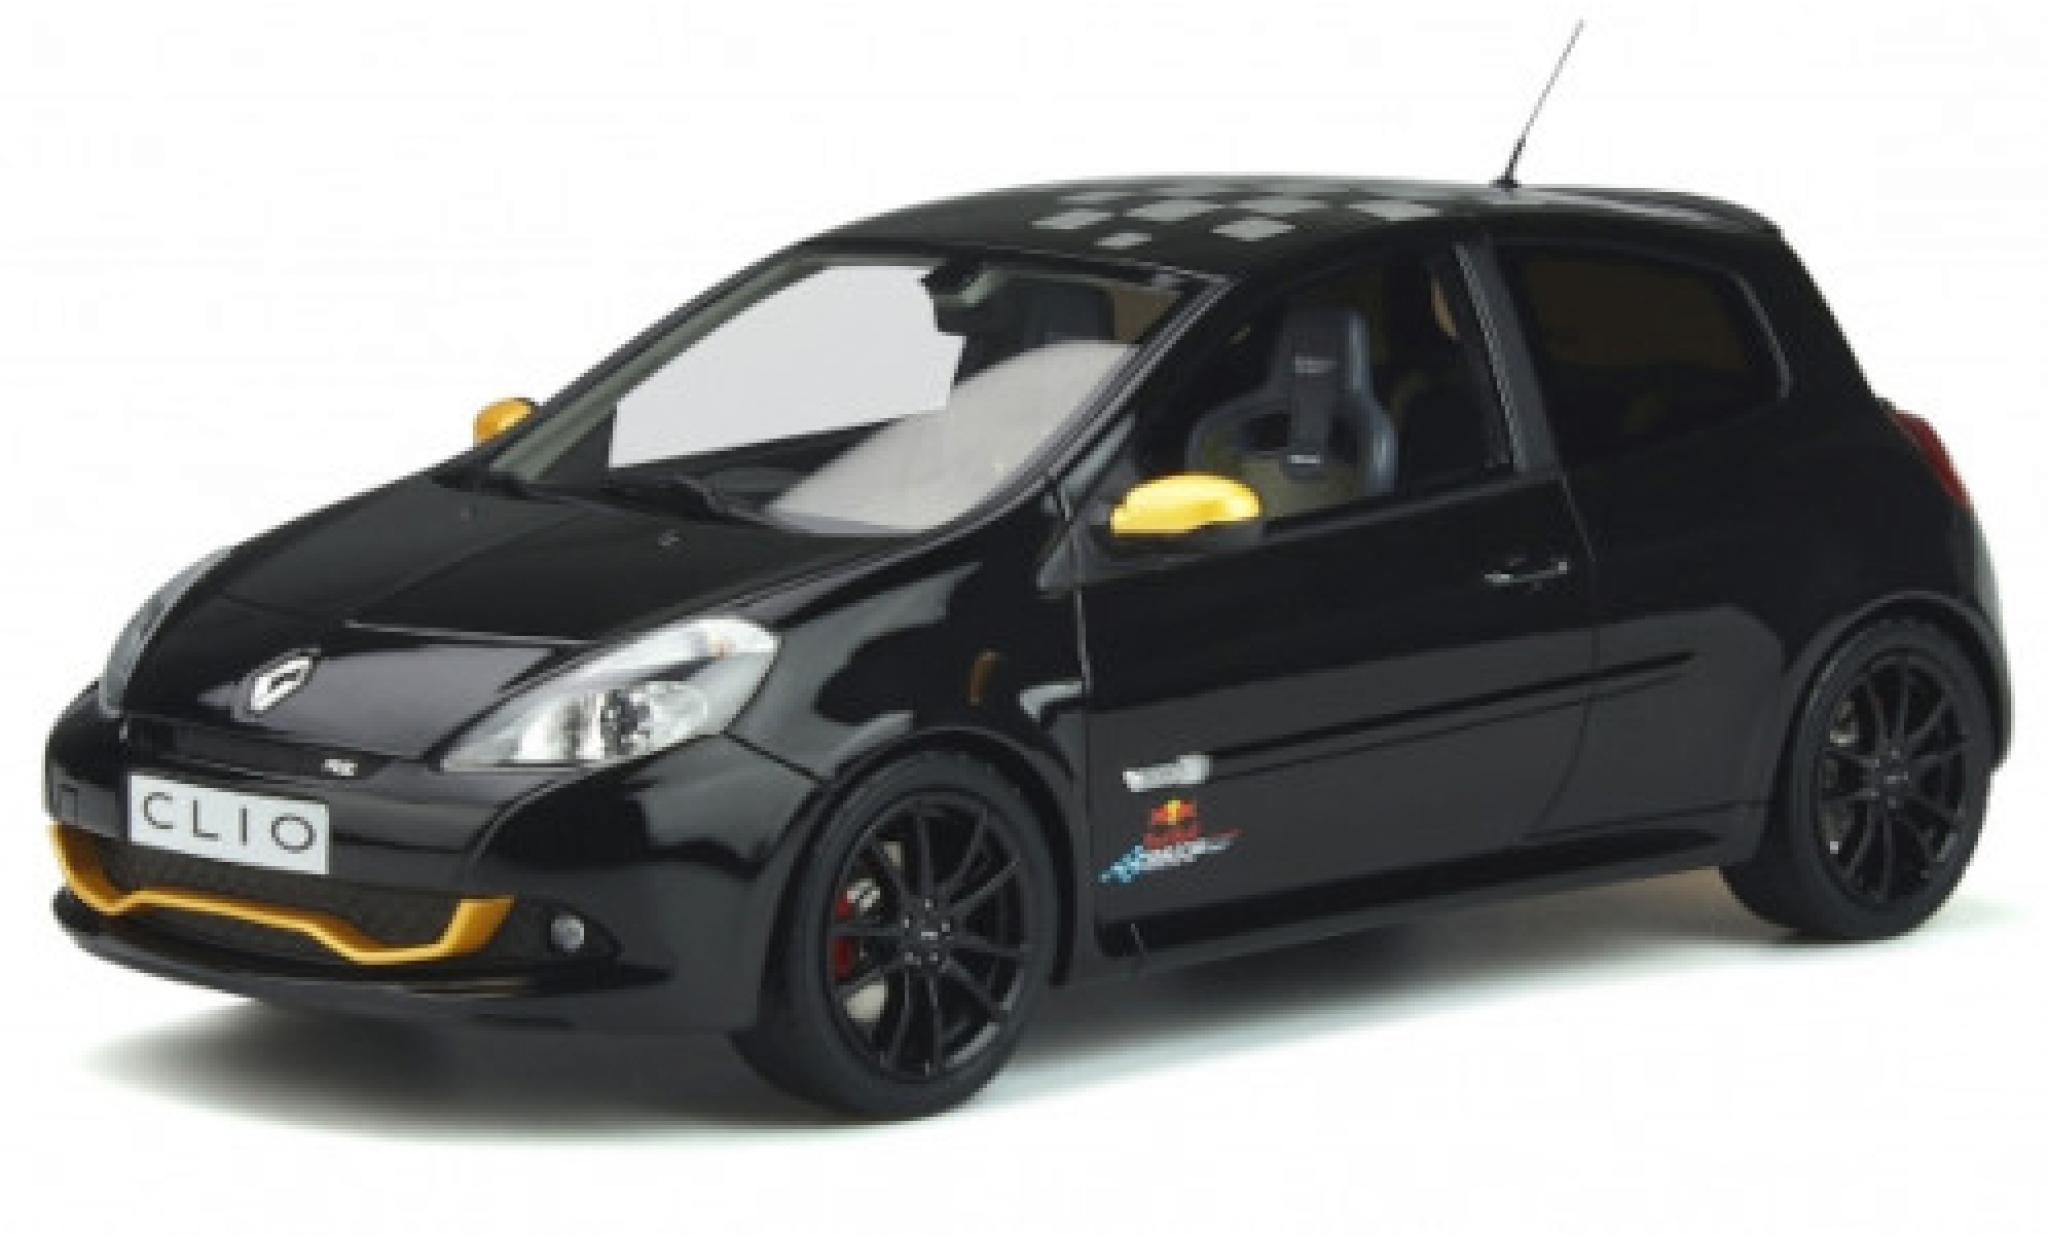 Renault Clio 1/18 Ottomobile 3 R.S. Red Bull Racing RB7 noire/Dekor 2012